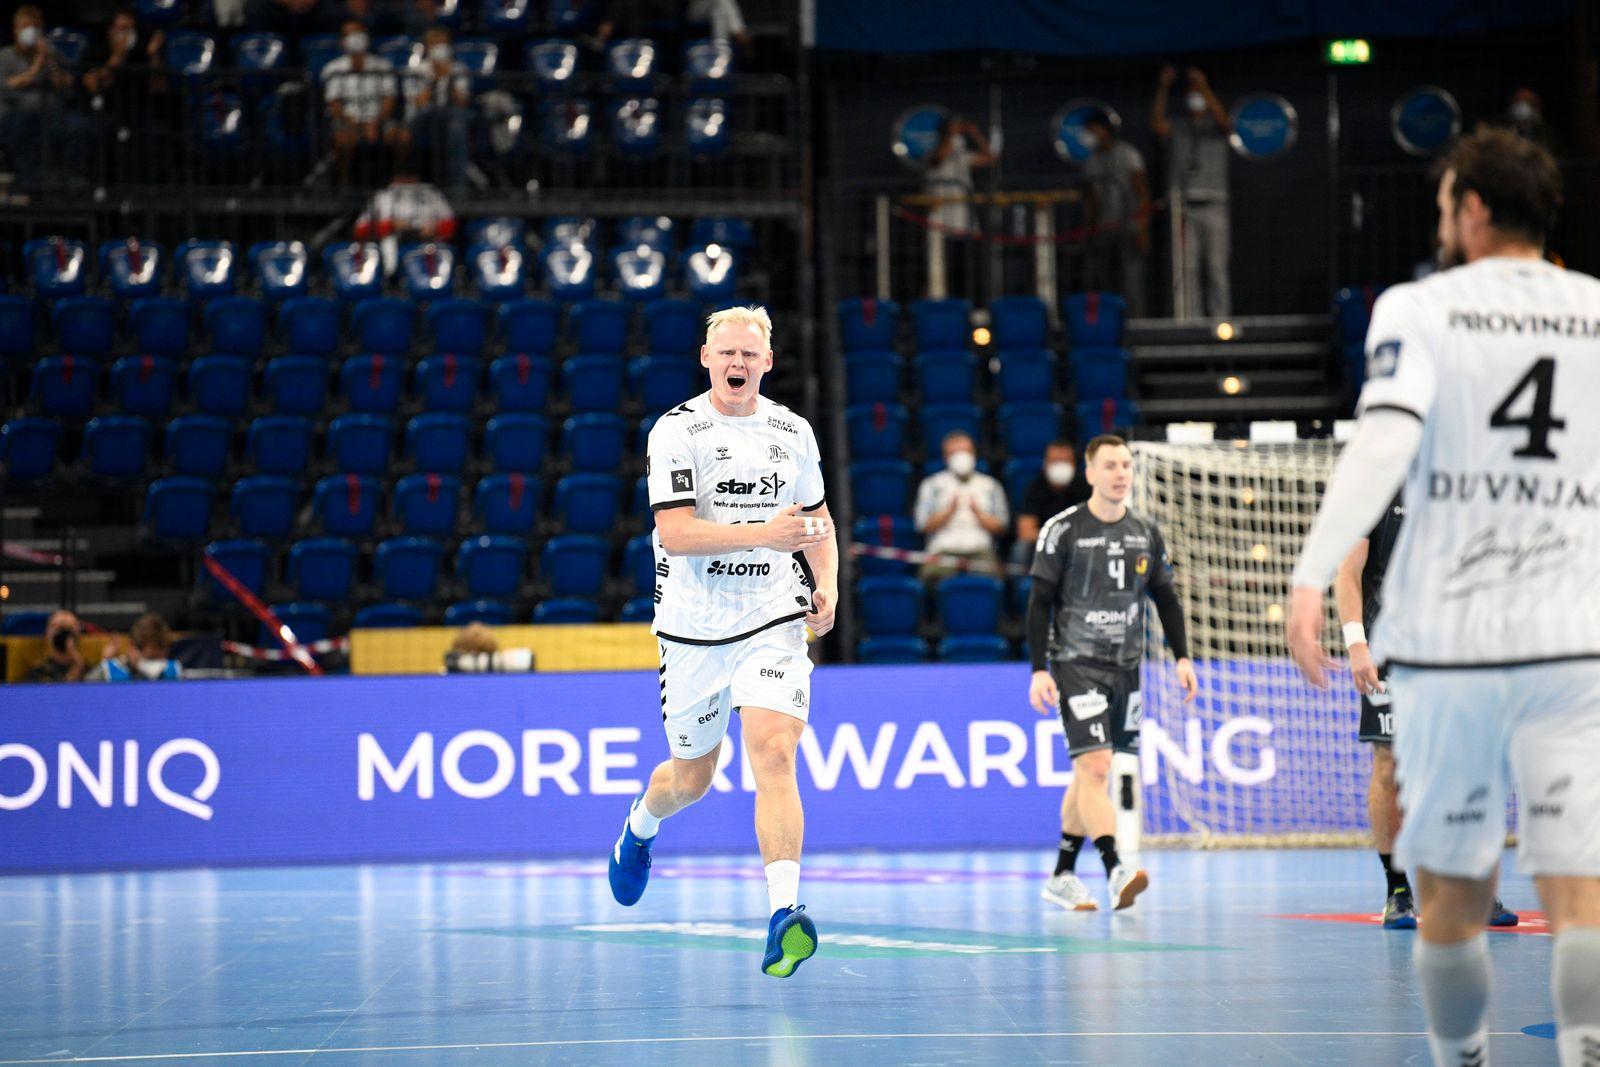 Patrick Wiencek (THW Kiel, 17), Handball, Männer, THW Kiel vs HBC Nantes, Champions-League, 2. Spieltag, Gruppenphase, 2